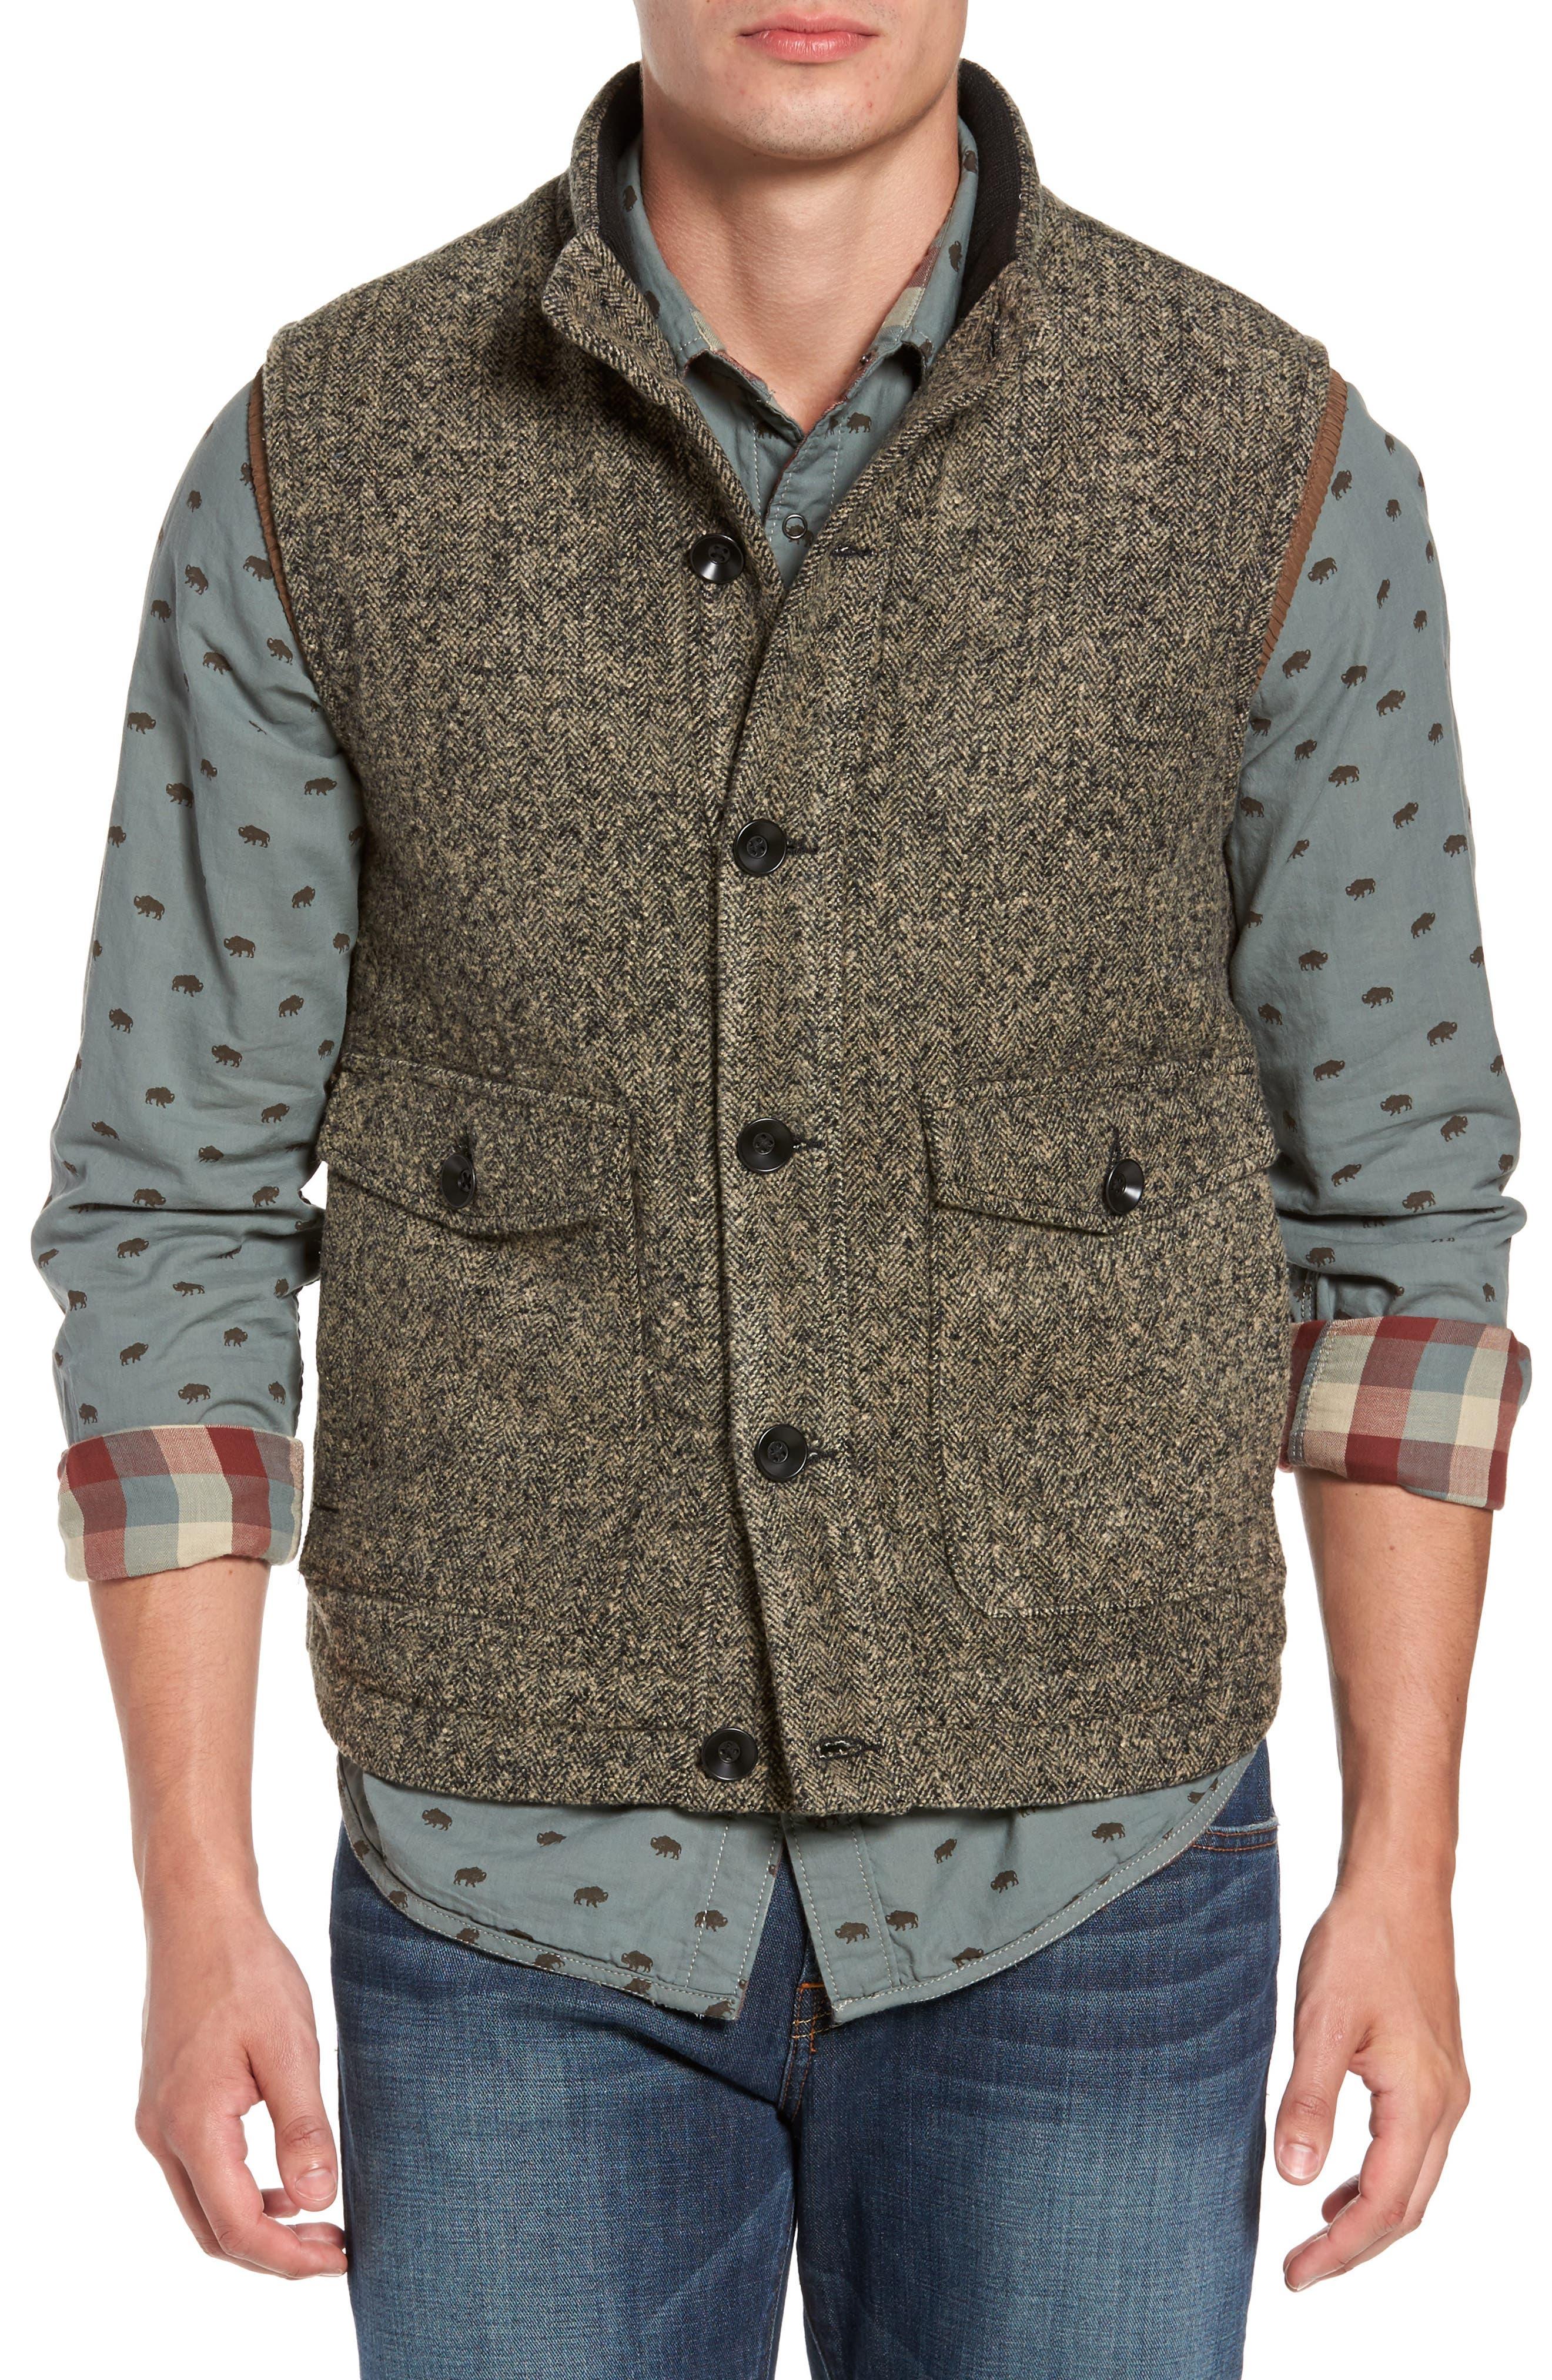 Jeremiah Sanford Herringbone Vest